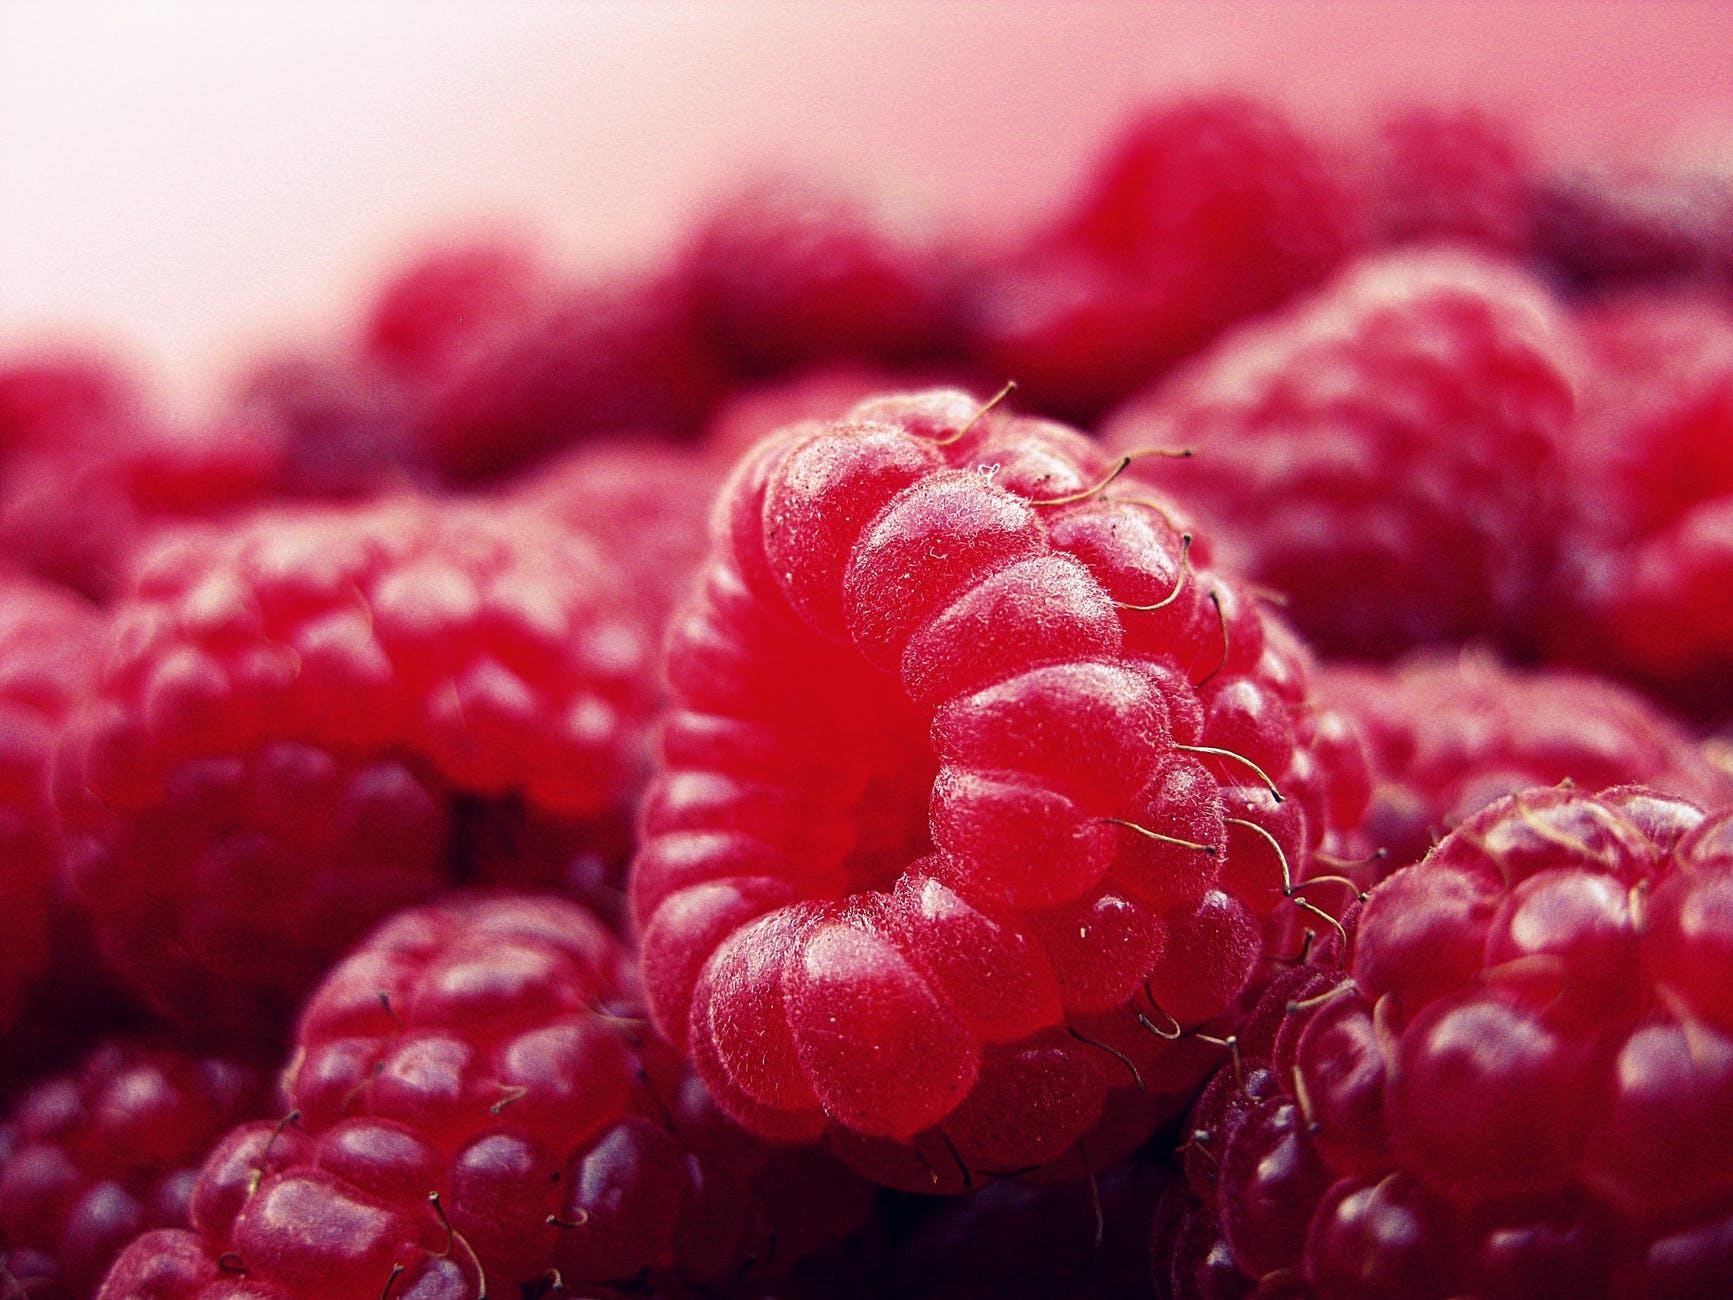 raspberry-fruits-fresh-red-52536